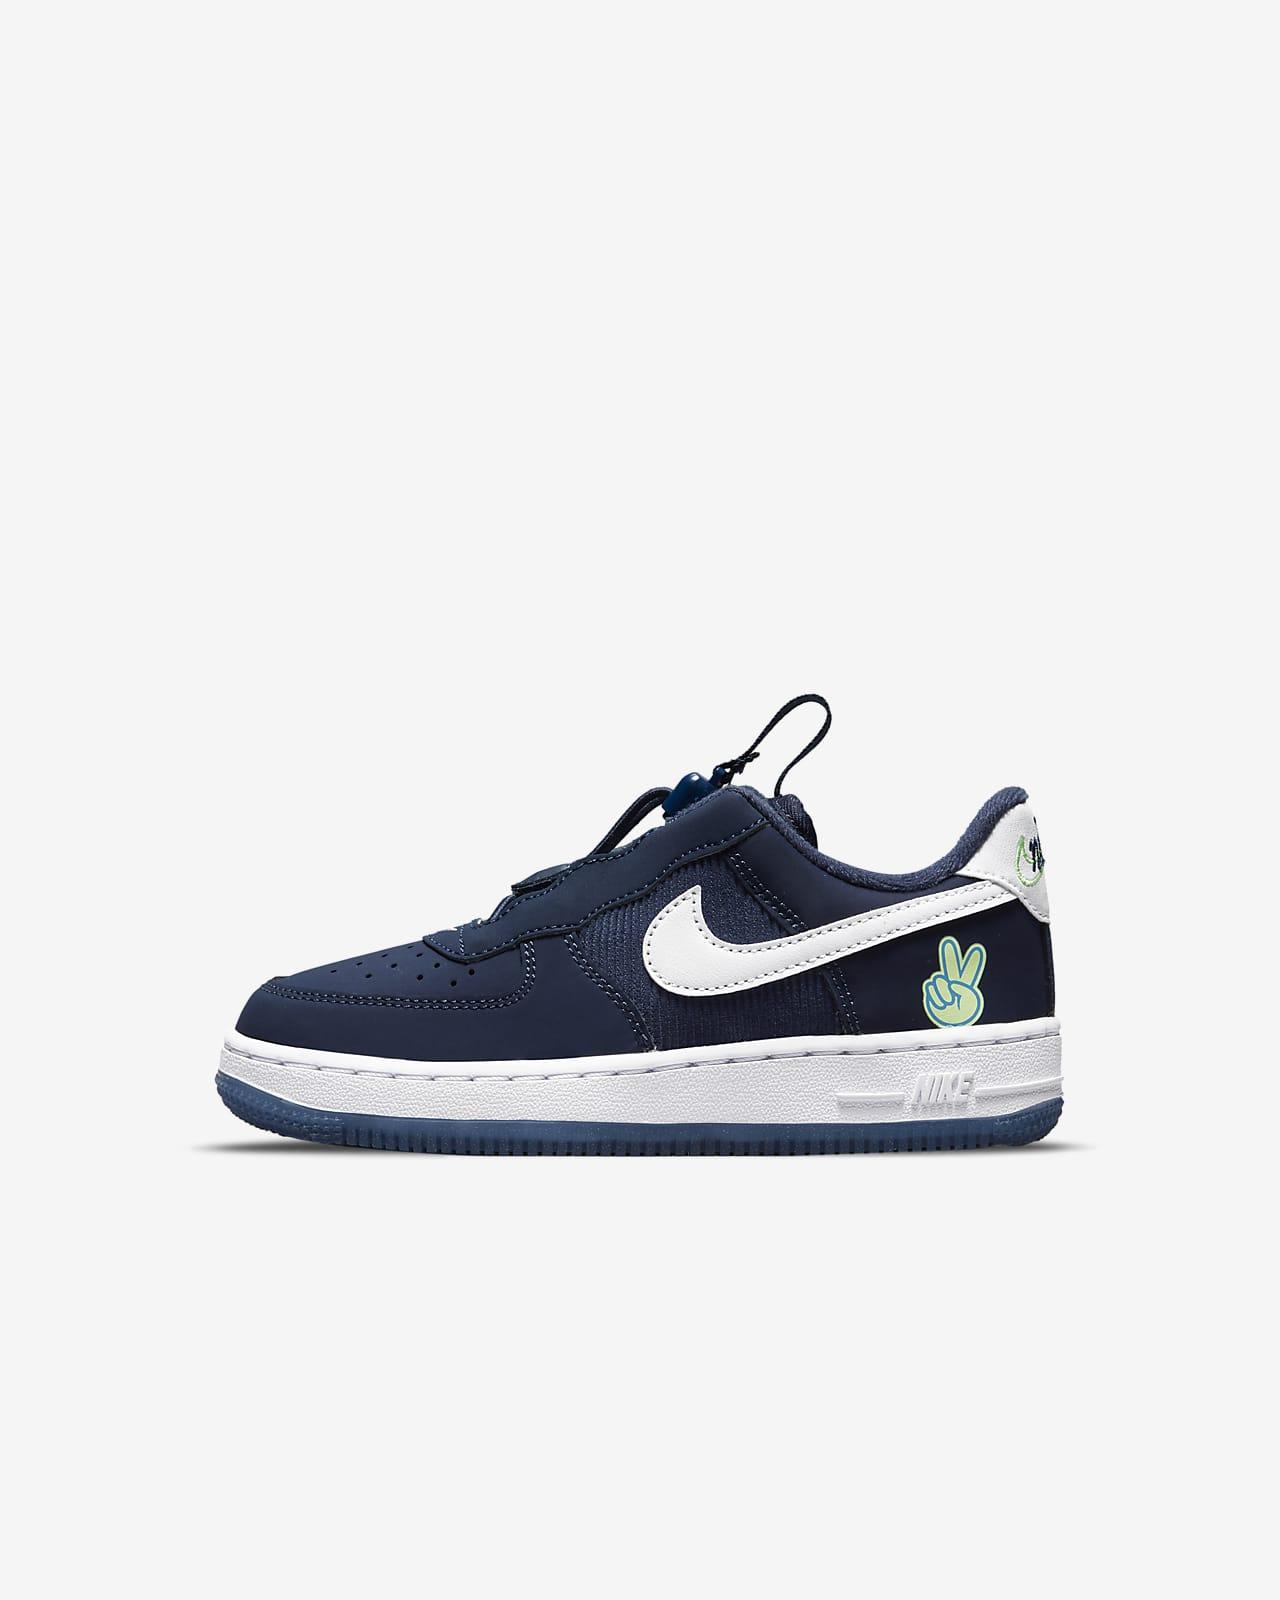 Calzado para niños talla pequeña Nike Force 1 Toggle SE